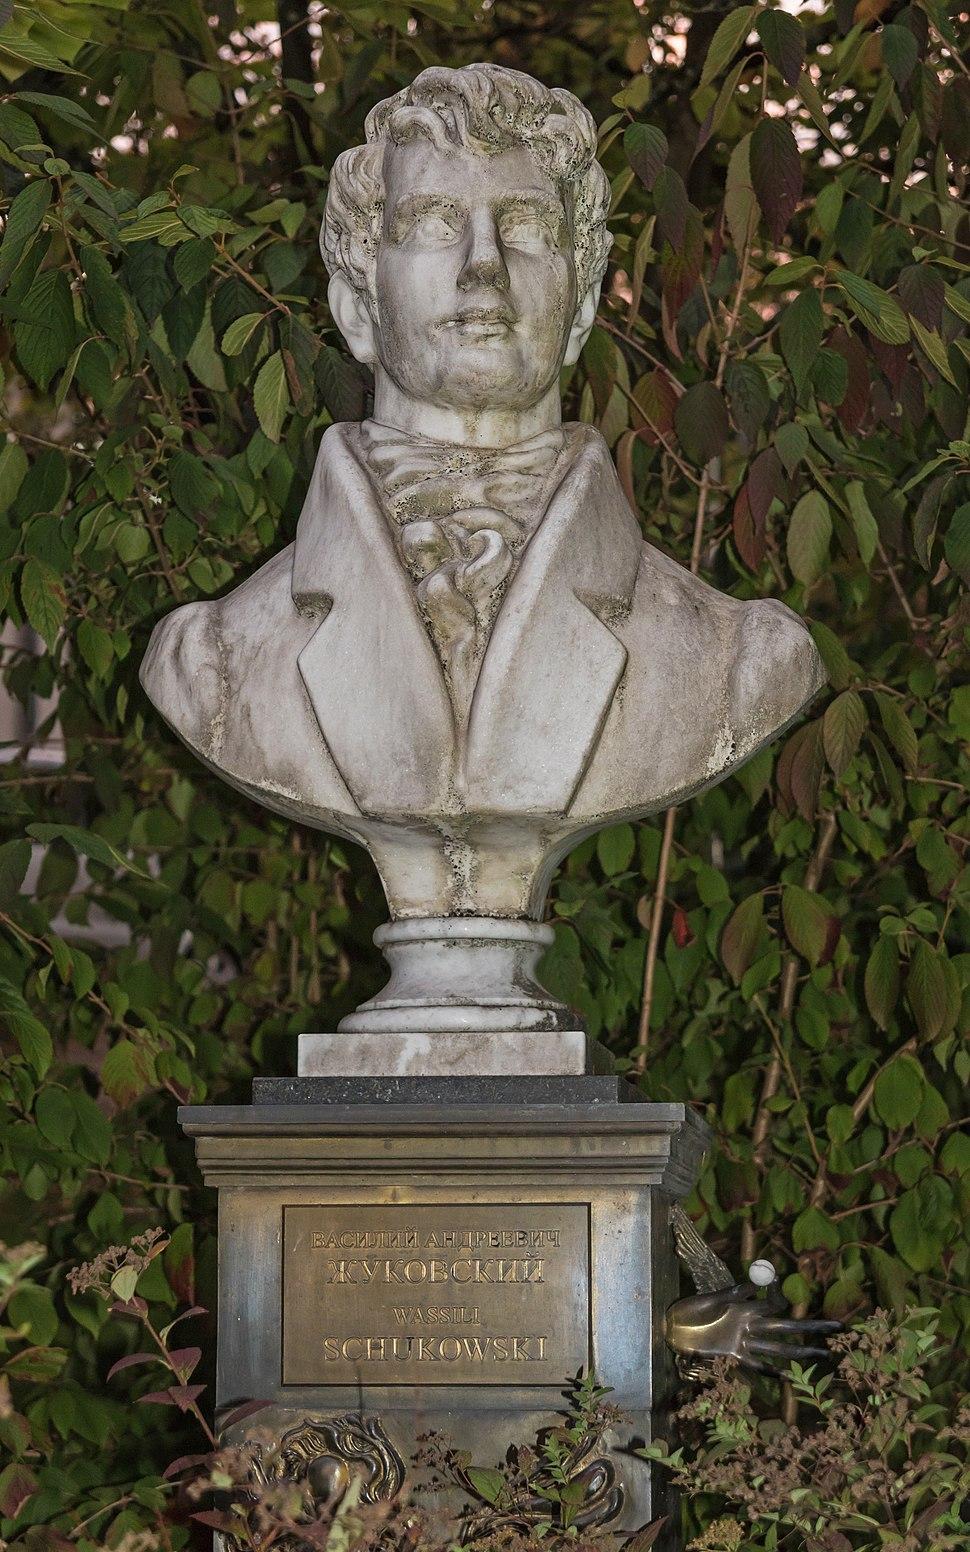 Baden-Baden 10-2015 img28 Zhukovsky bust